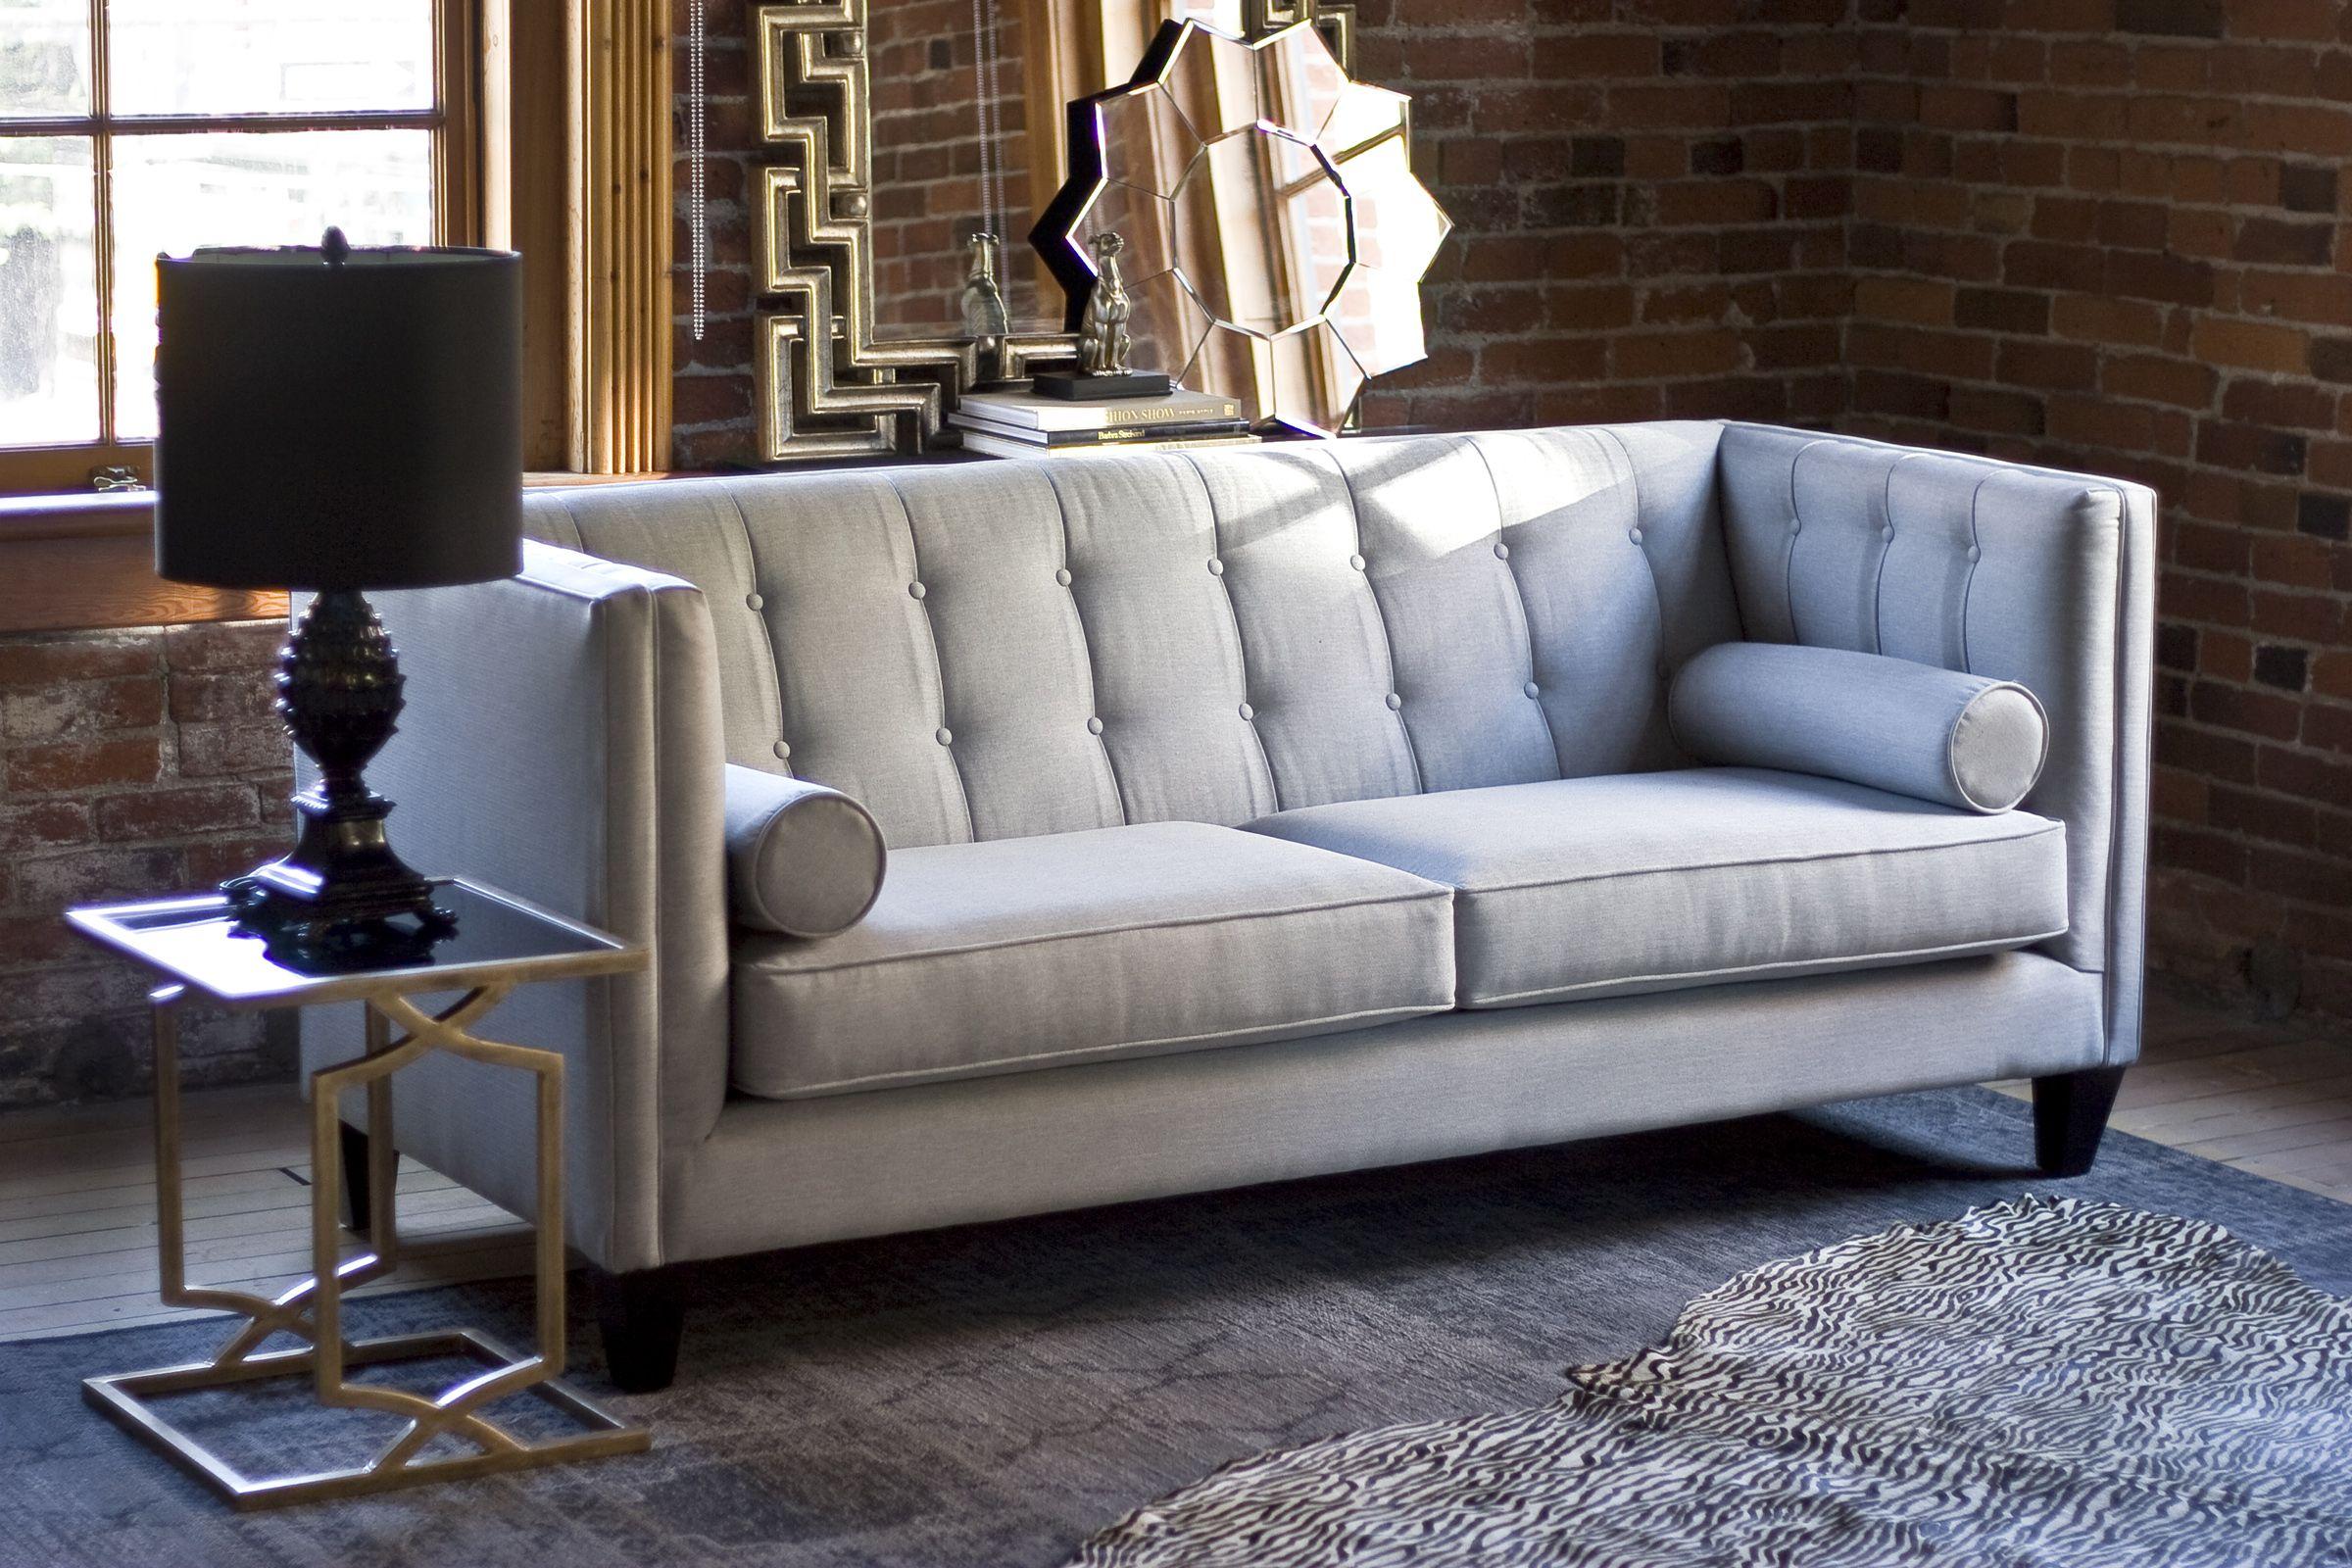 Custom Sofa Mississauga Contemporary Furniture Stores Contemporary Furniture Furniture